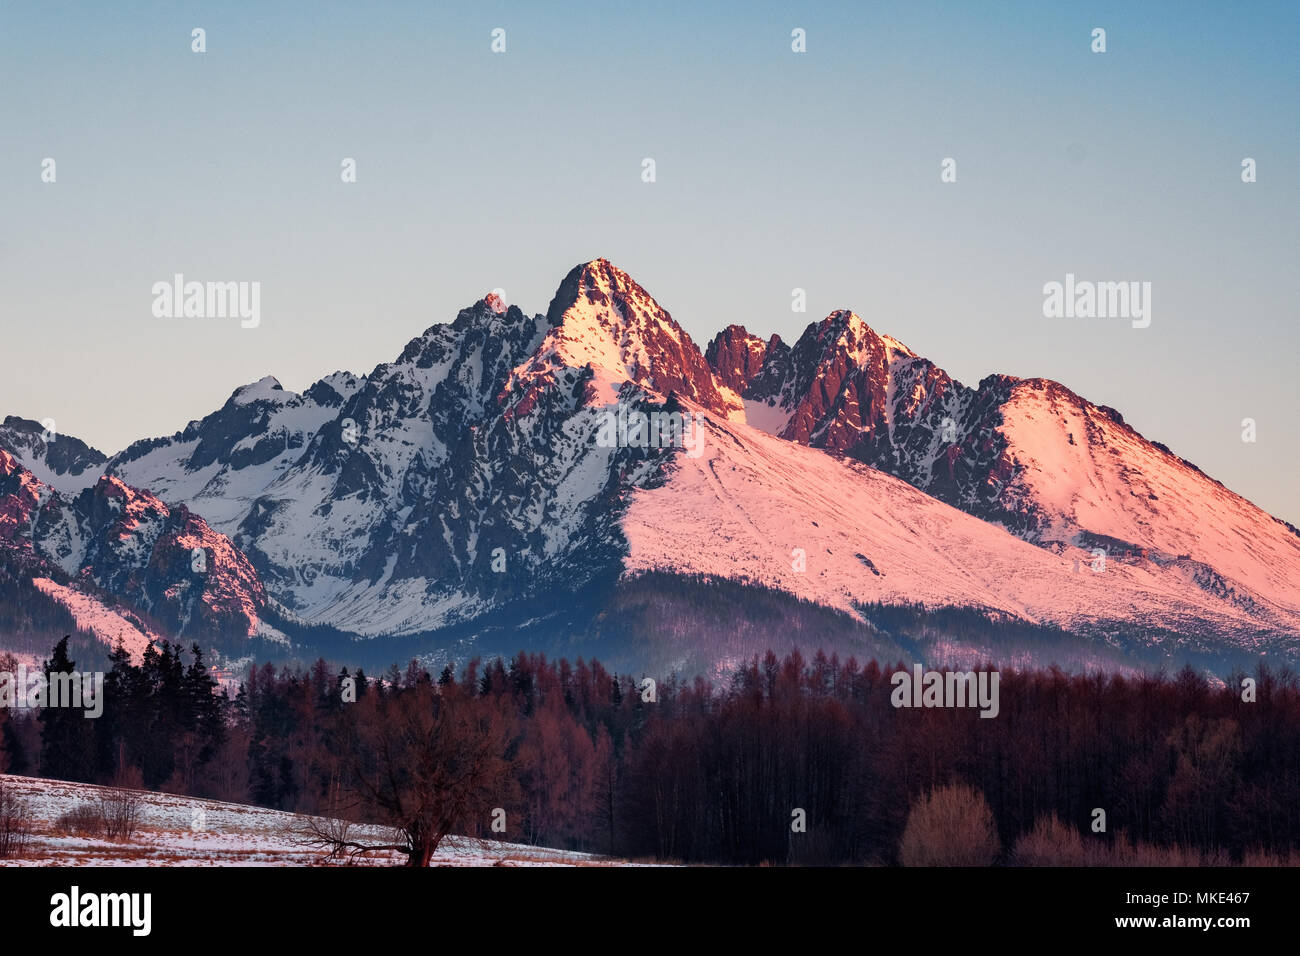 Sunrise in High Tatras - Stock Image